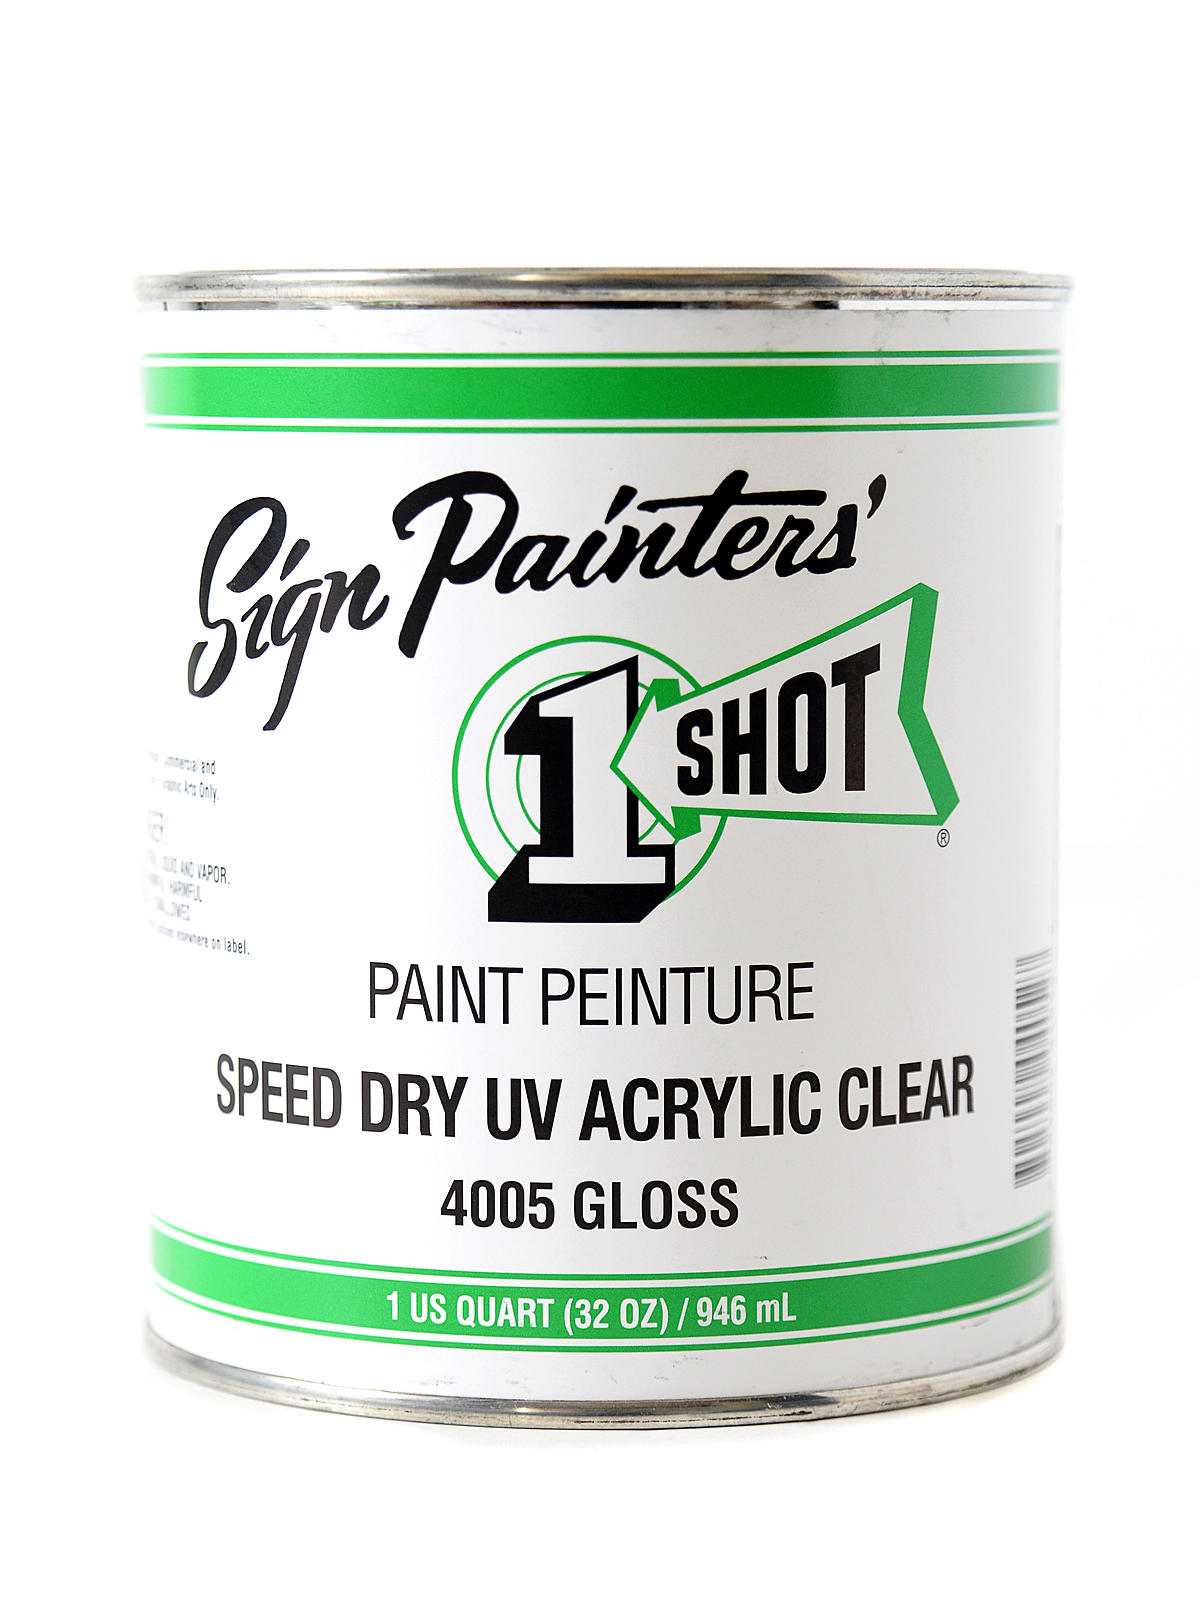 Speed Dry UV Acrylic Clear